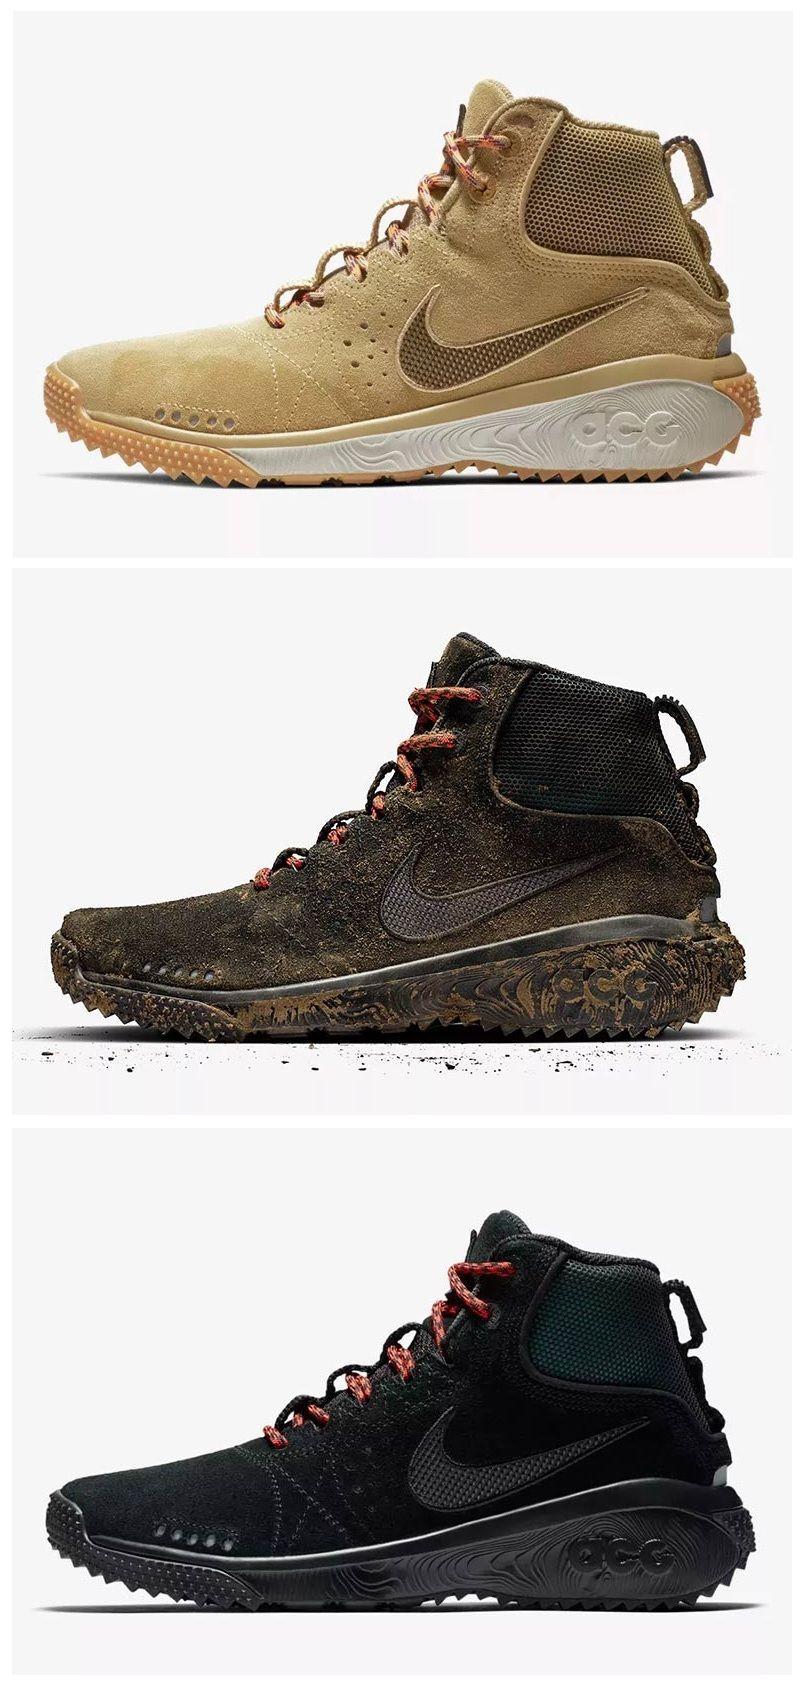 Rest   Nike acg, Nike acg boots